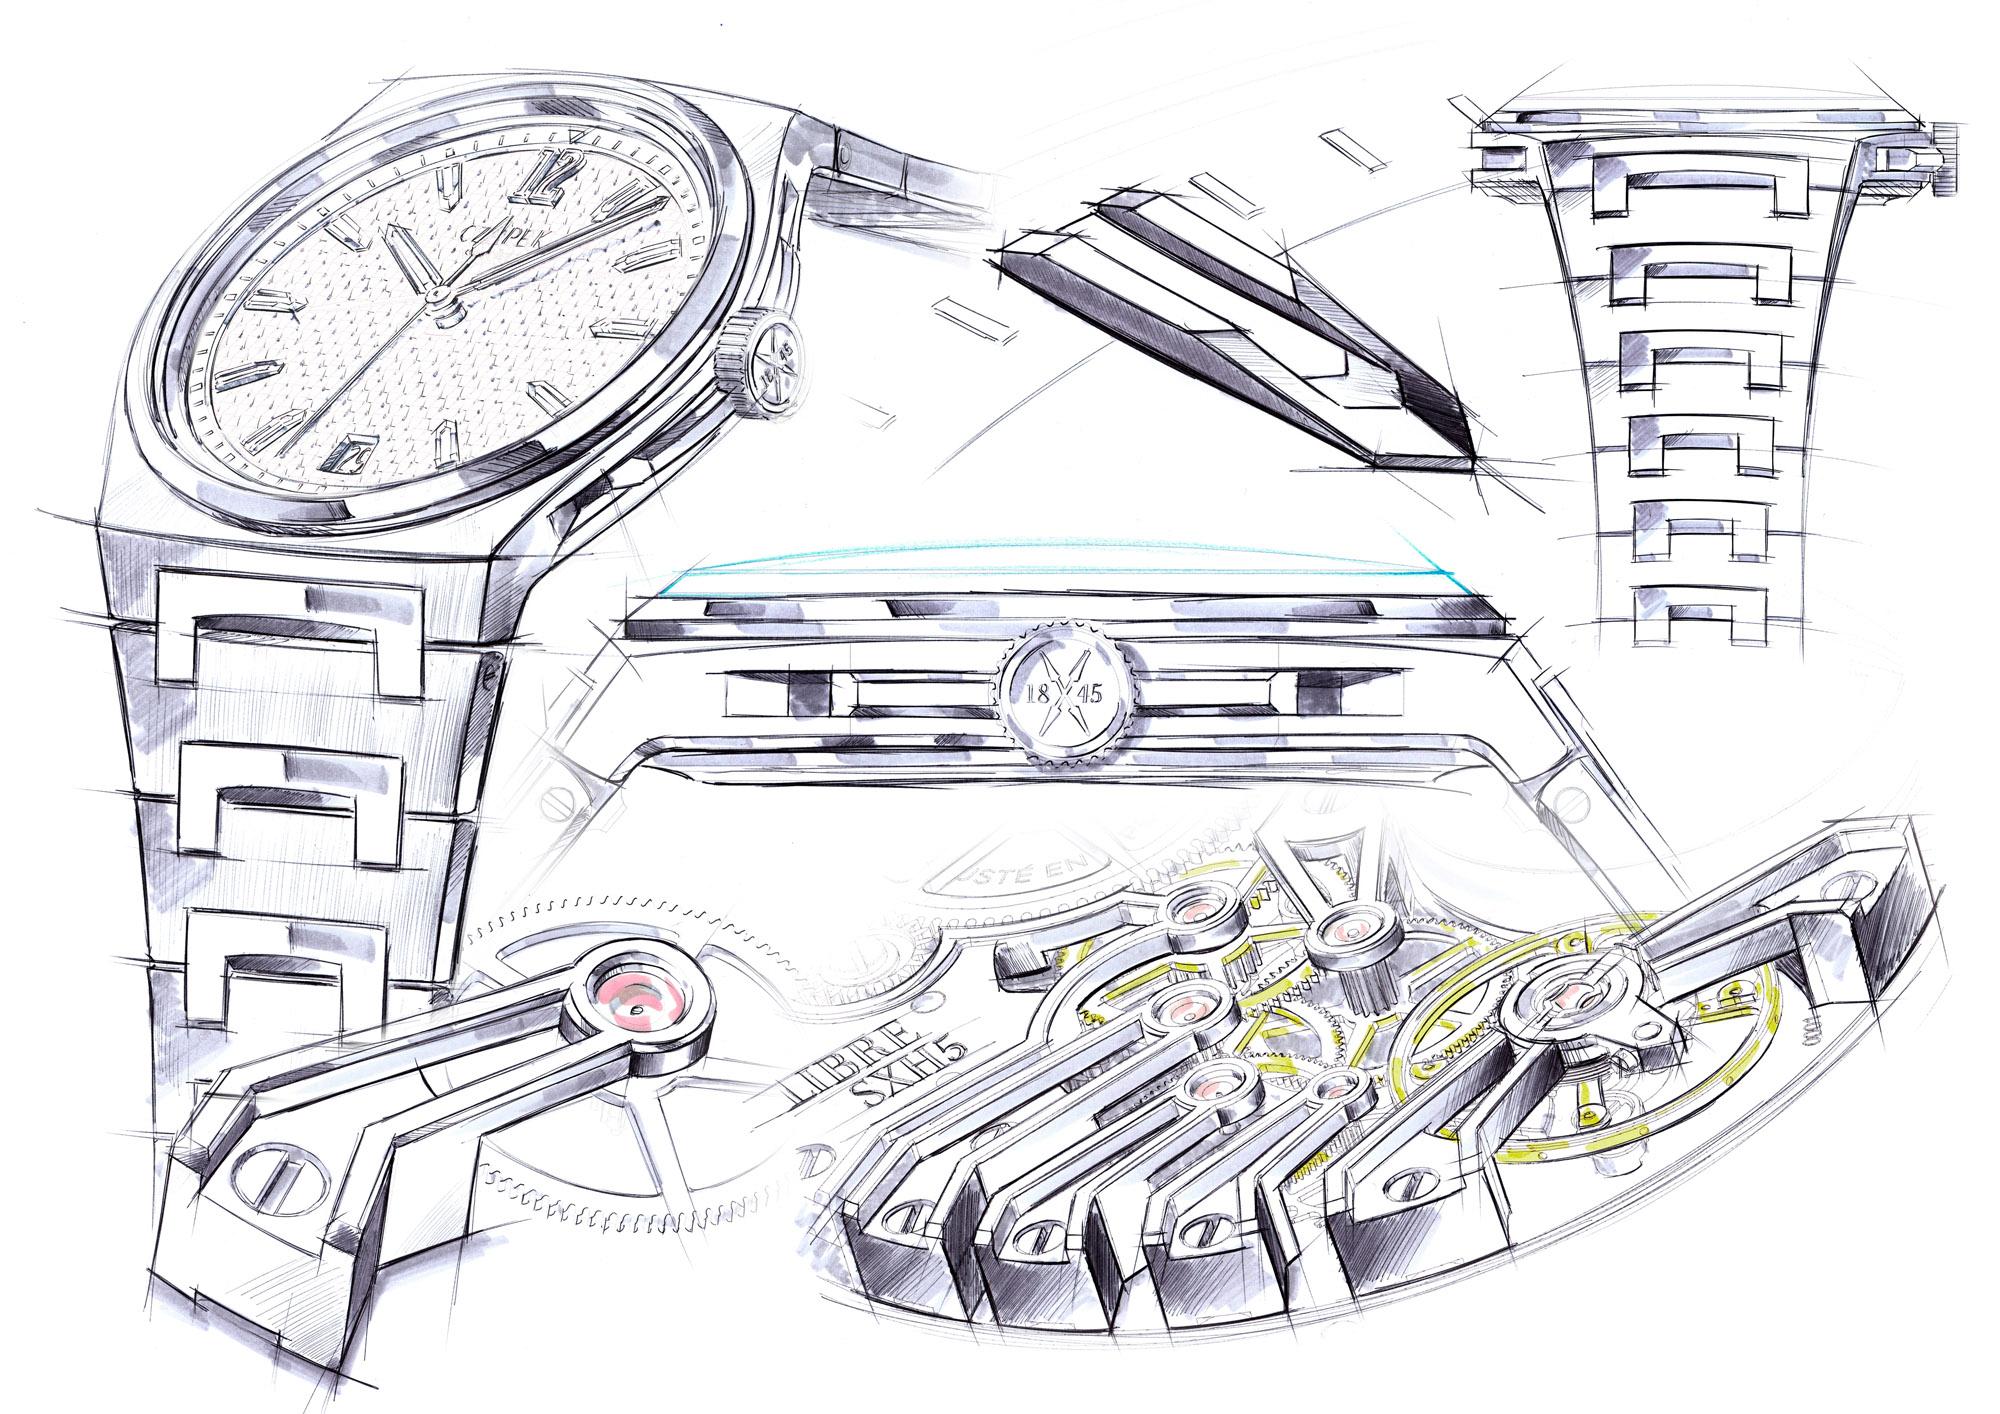 Czapek & Cie Antarctique Passage de Drake stainless steel sports watch sketch